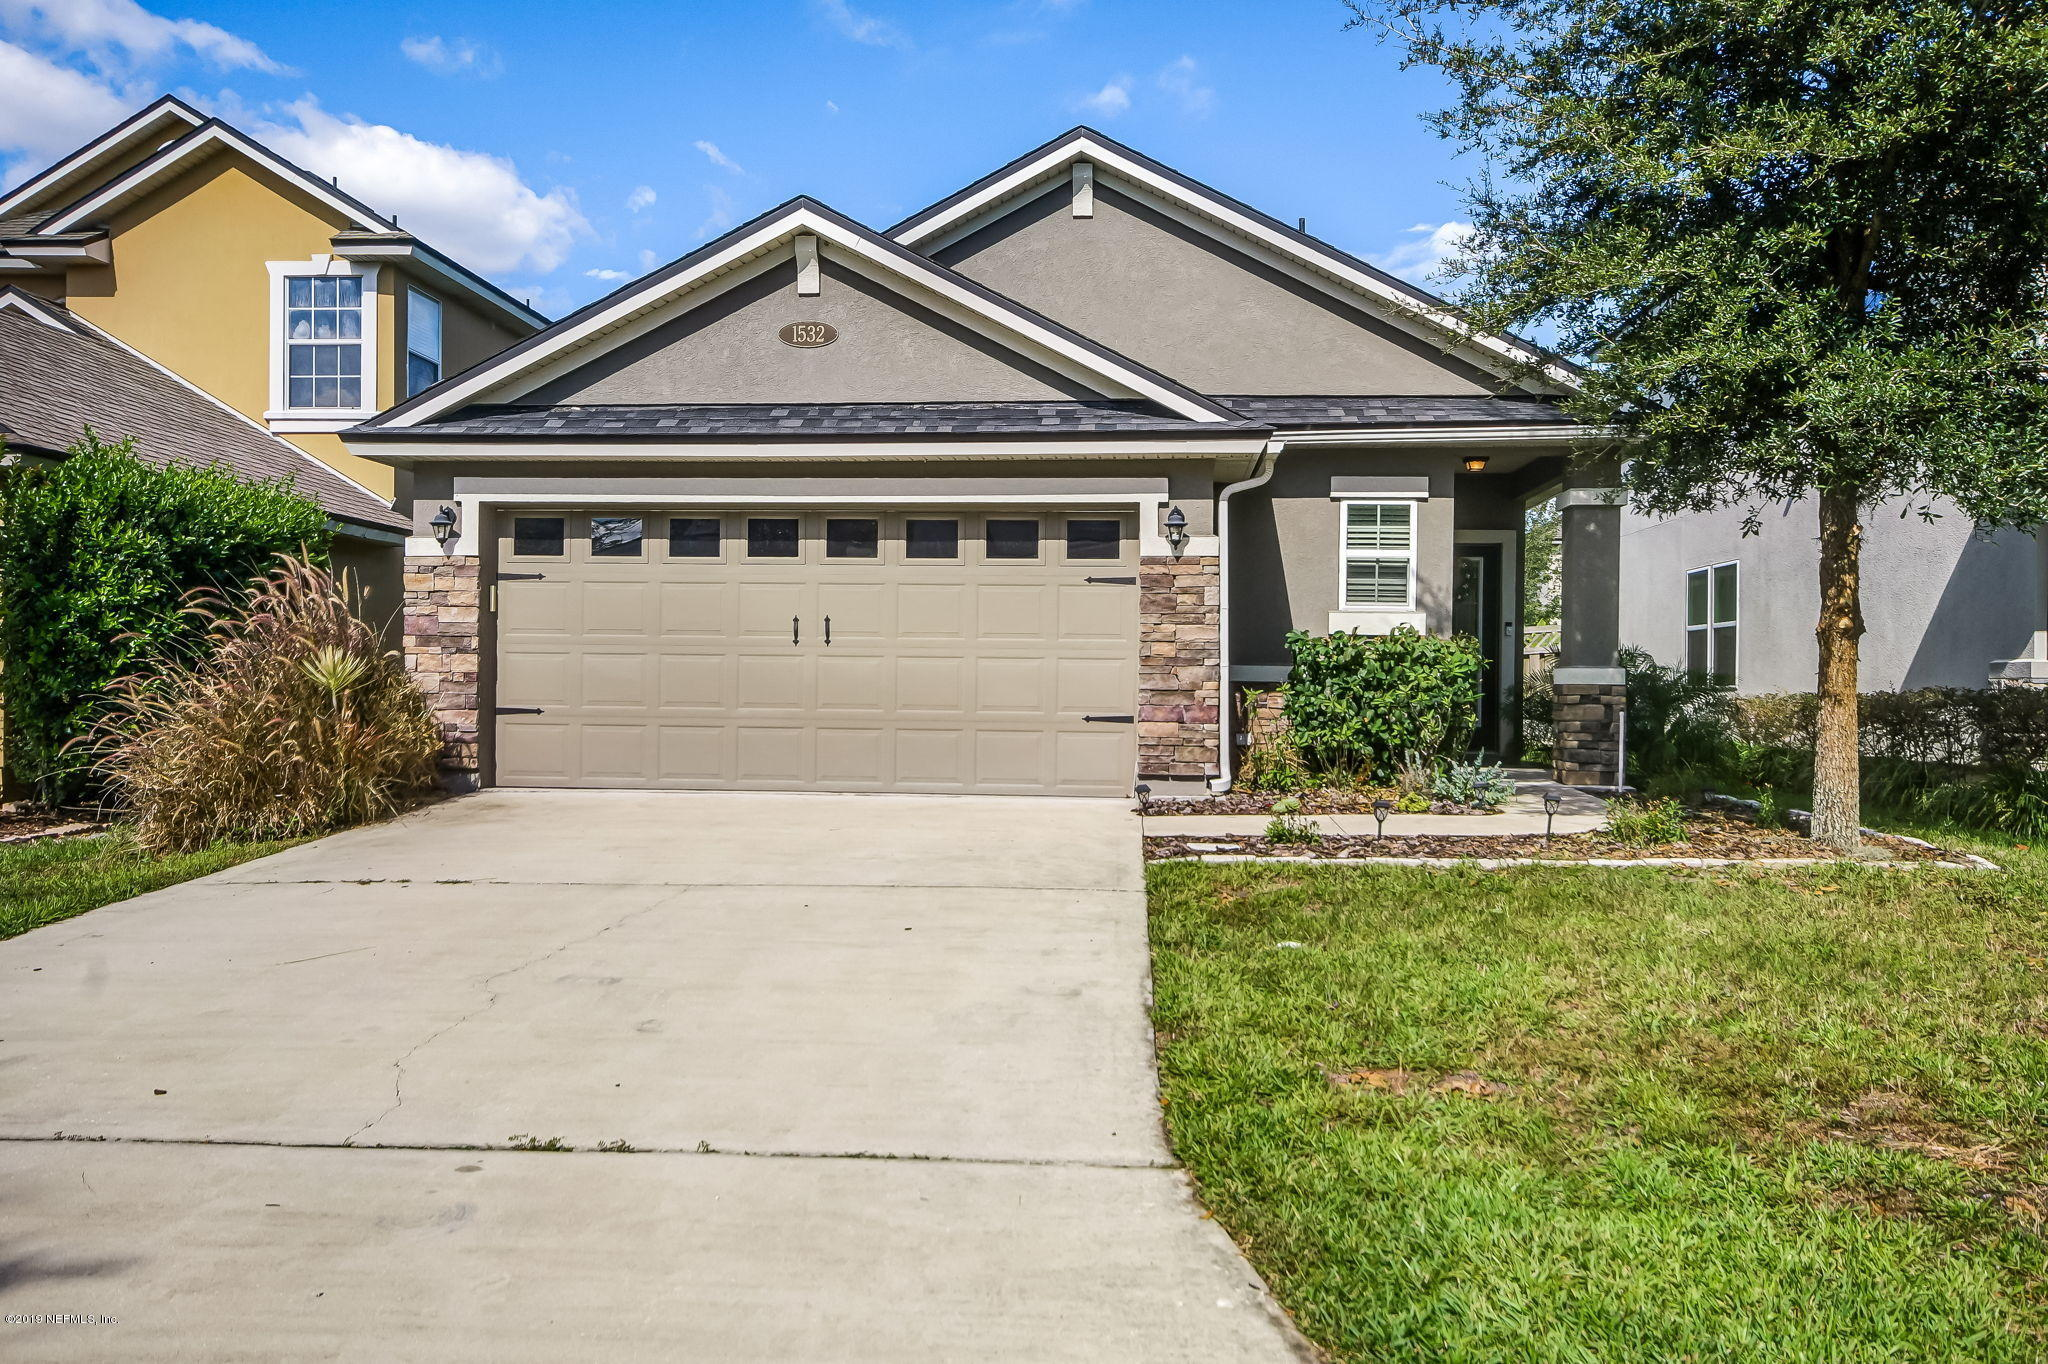 1532 TAWNY MARSH, ST AUGUSTINE, FLORIDA 32092, 3 Bedrooms Bedrooms, ,2 BathroomsBathrooms,For sale,TAWNY MARSH,1025395